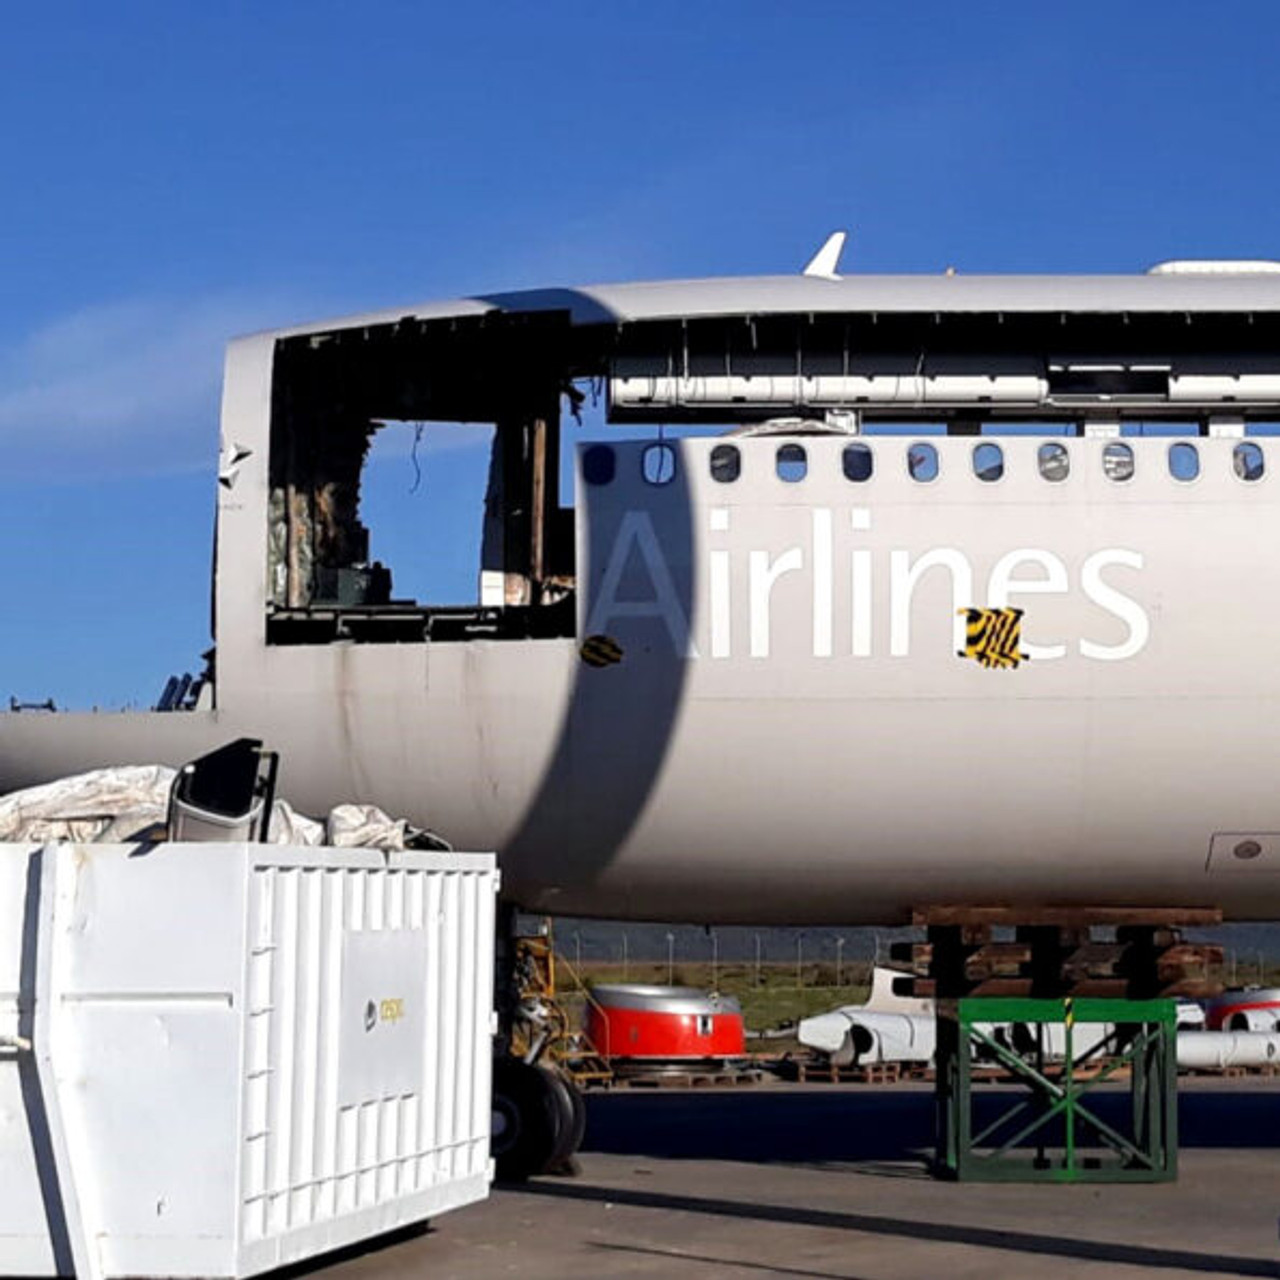 AviationTag Airbus A340-300 Keychain  - LN-RKG